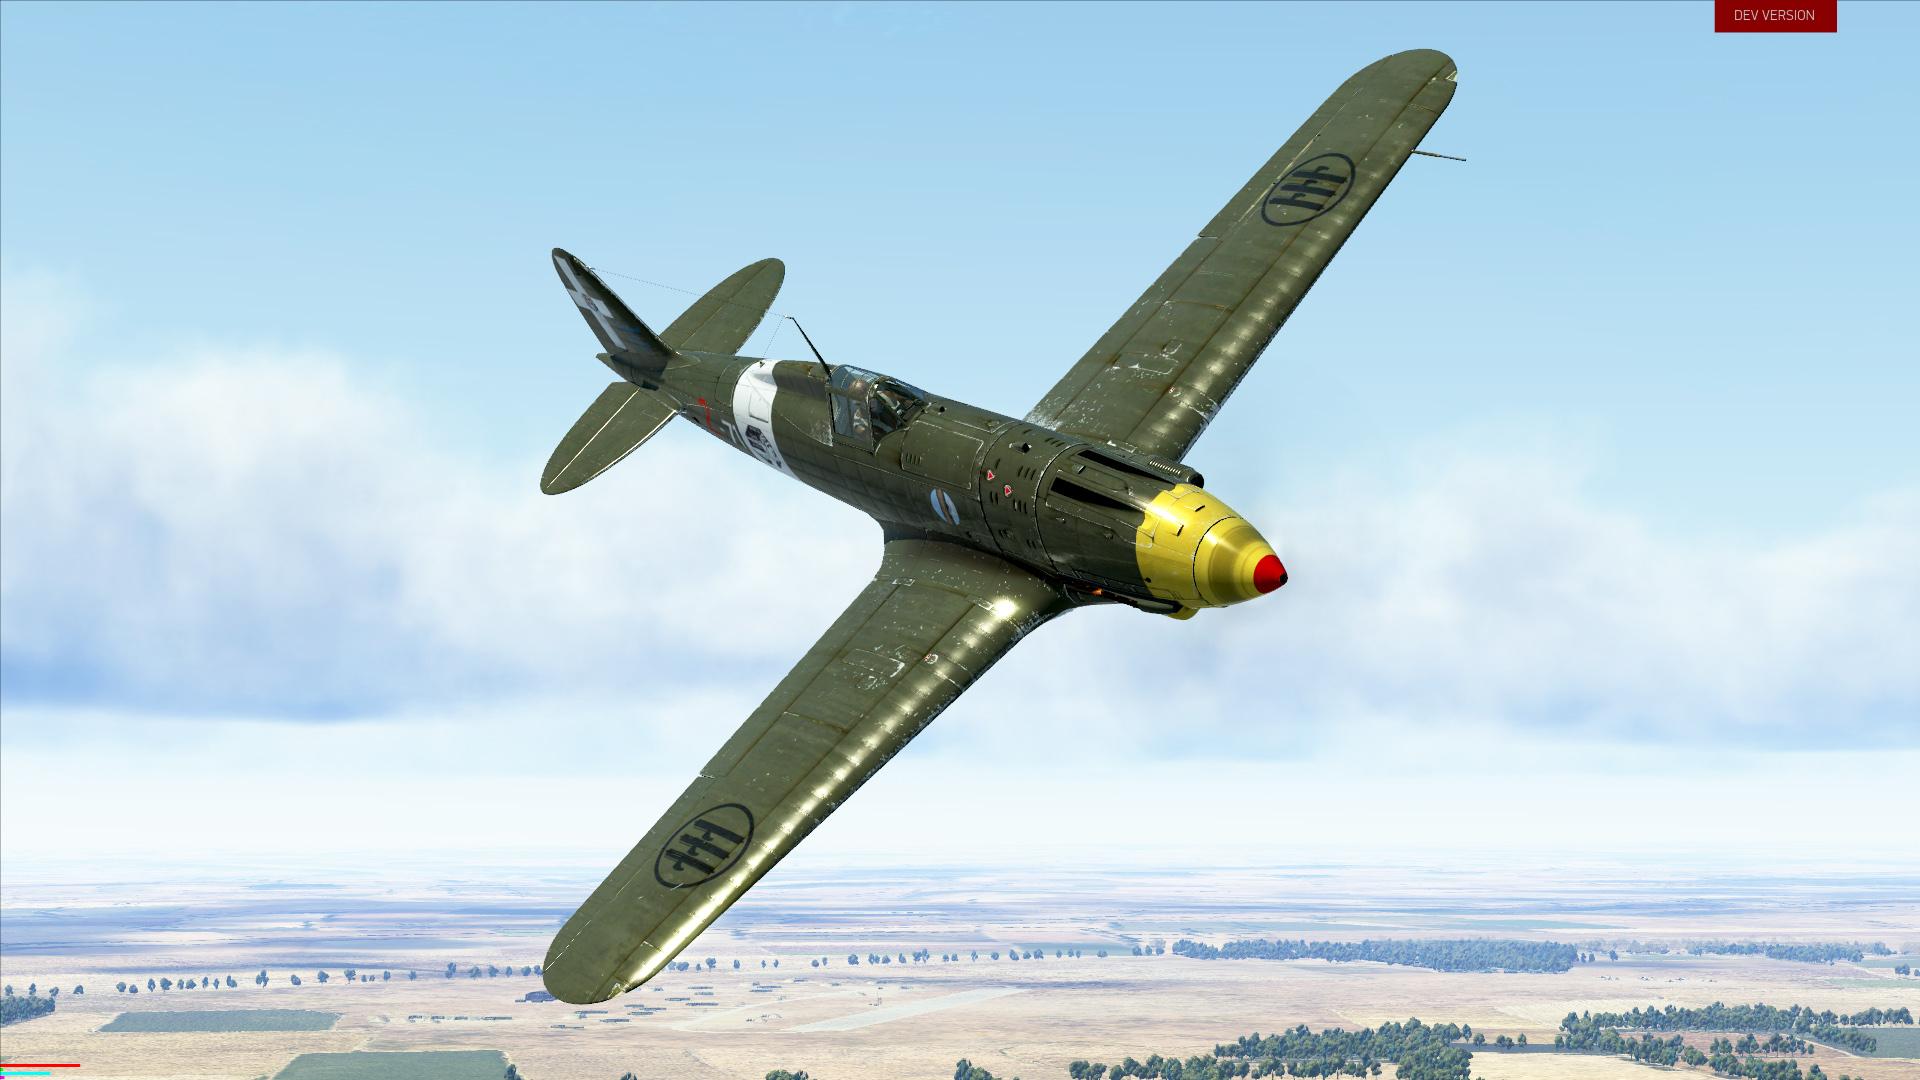 IL-2 Sturmovik: MC.202 Series VIII Collector Plane screenshot